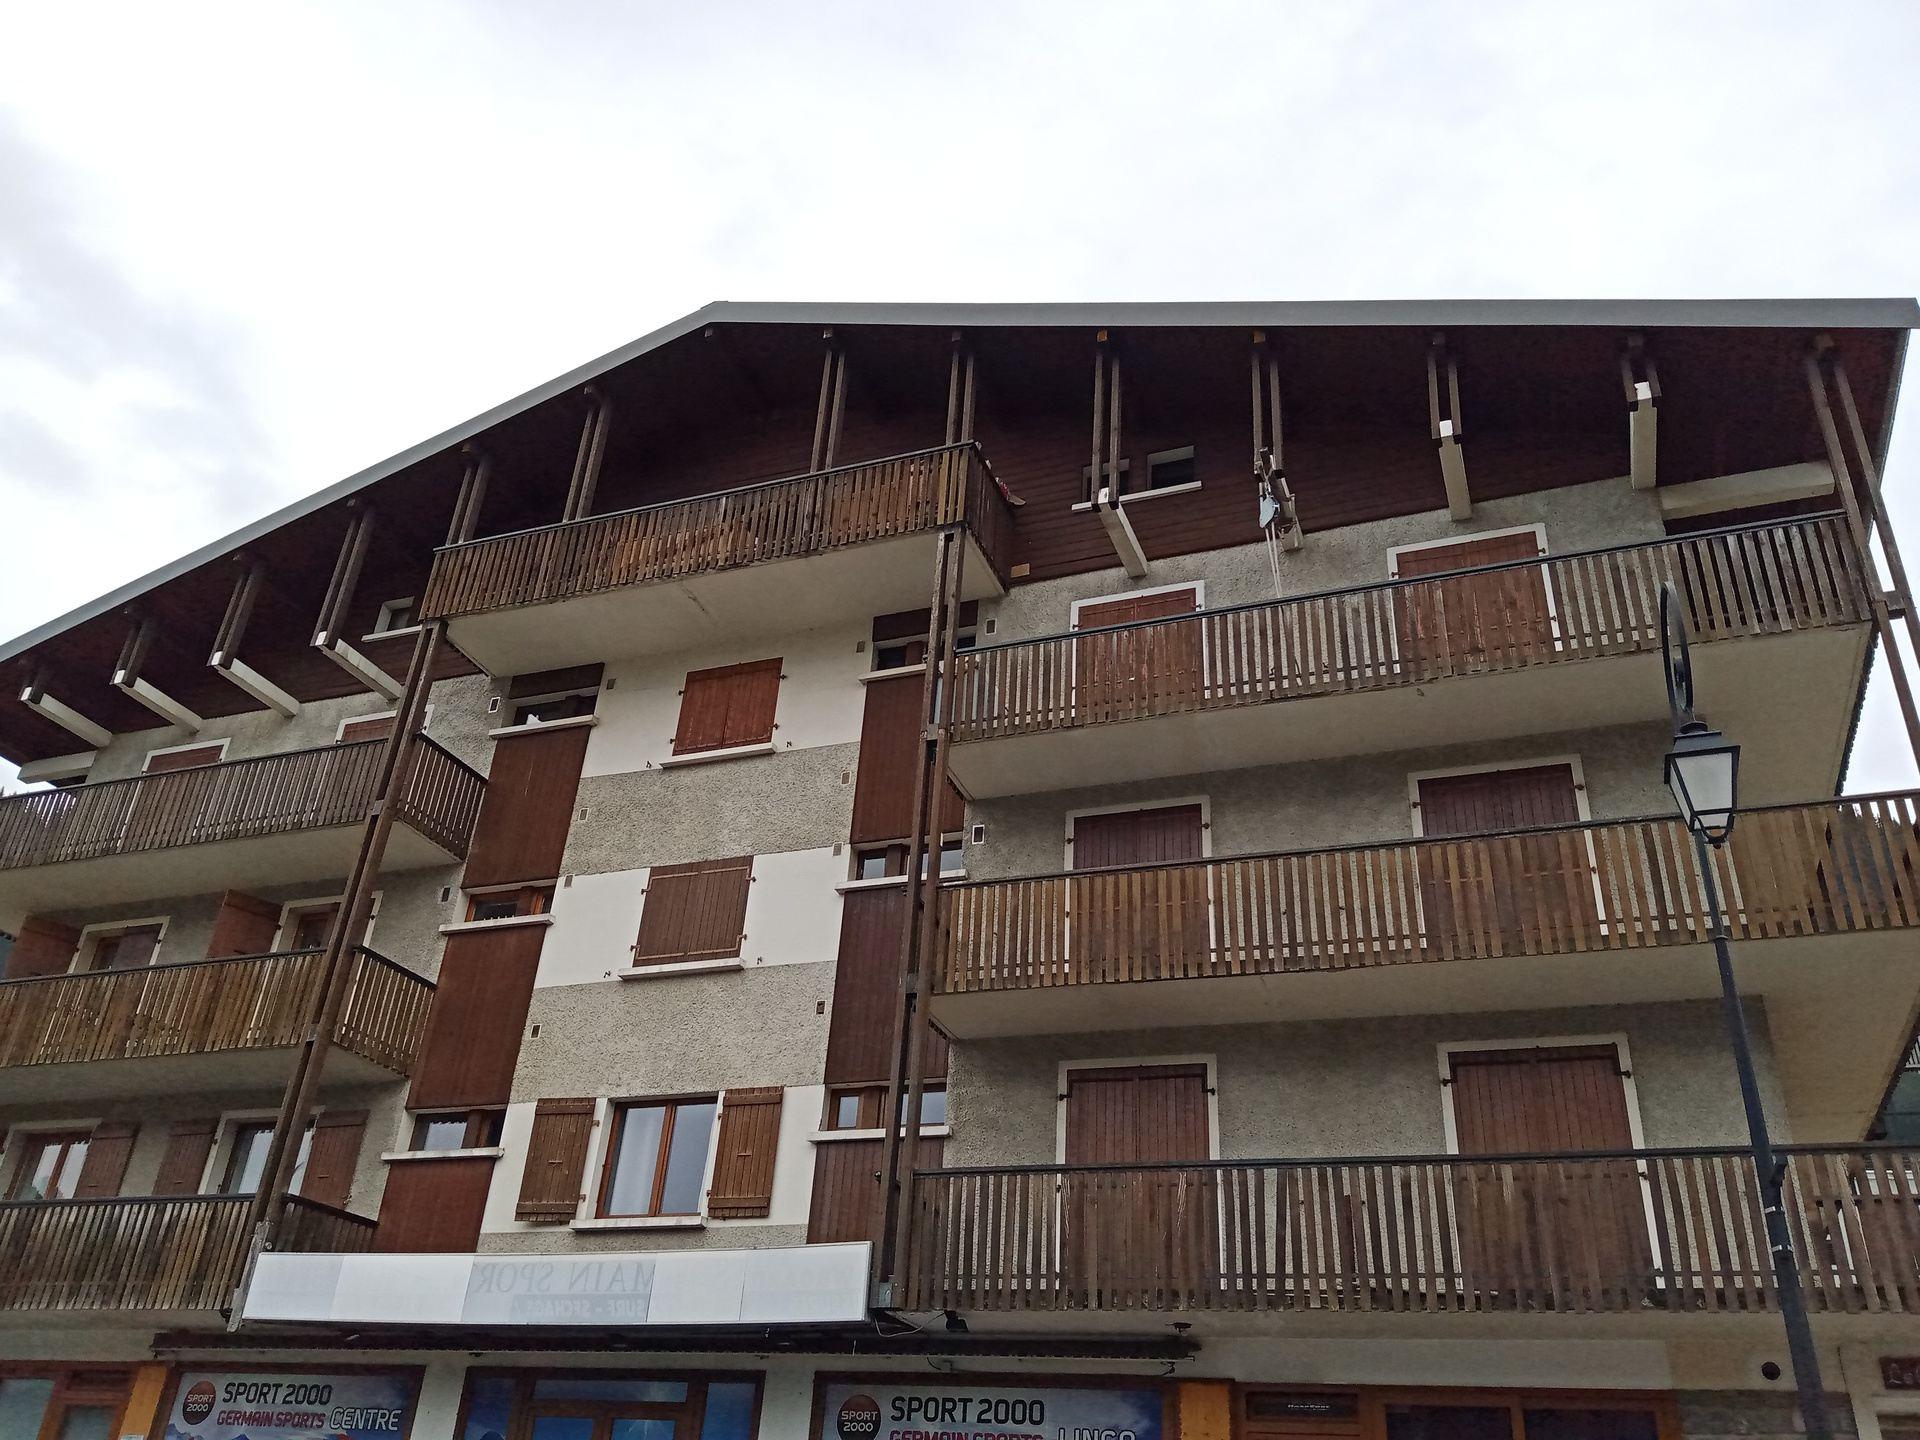 Apartments Le Grand Tetras